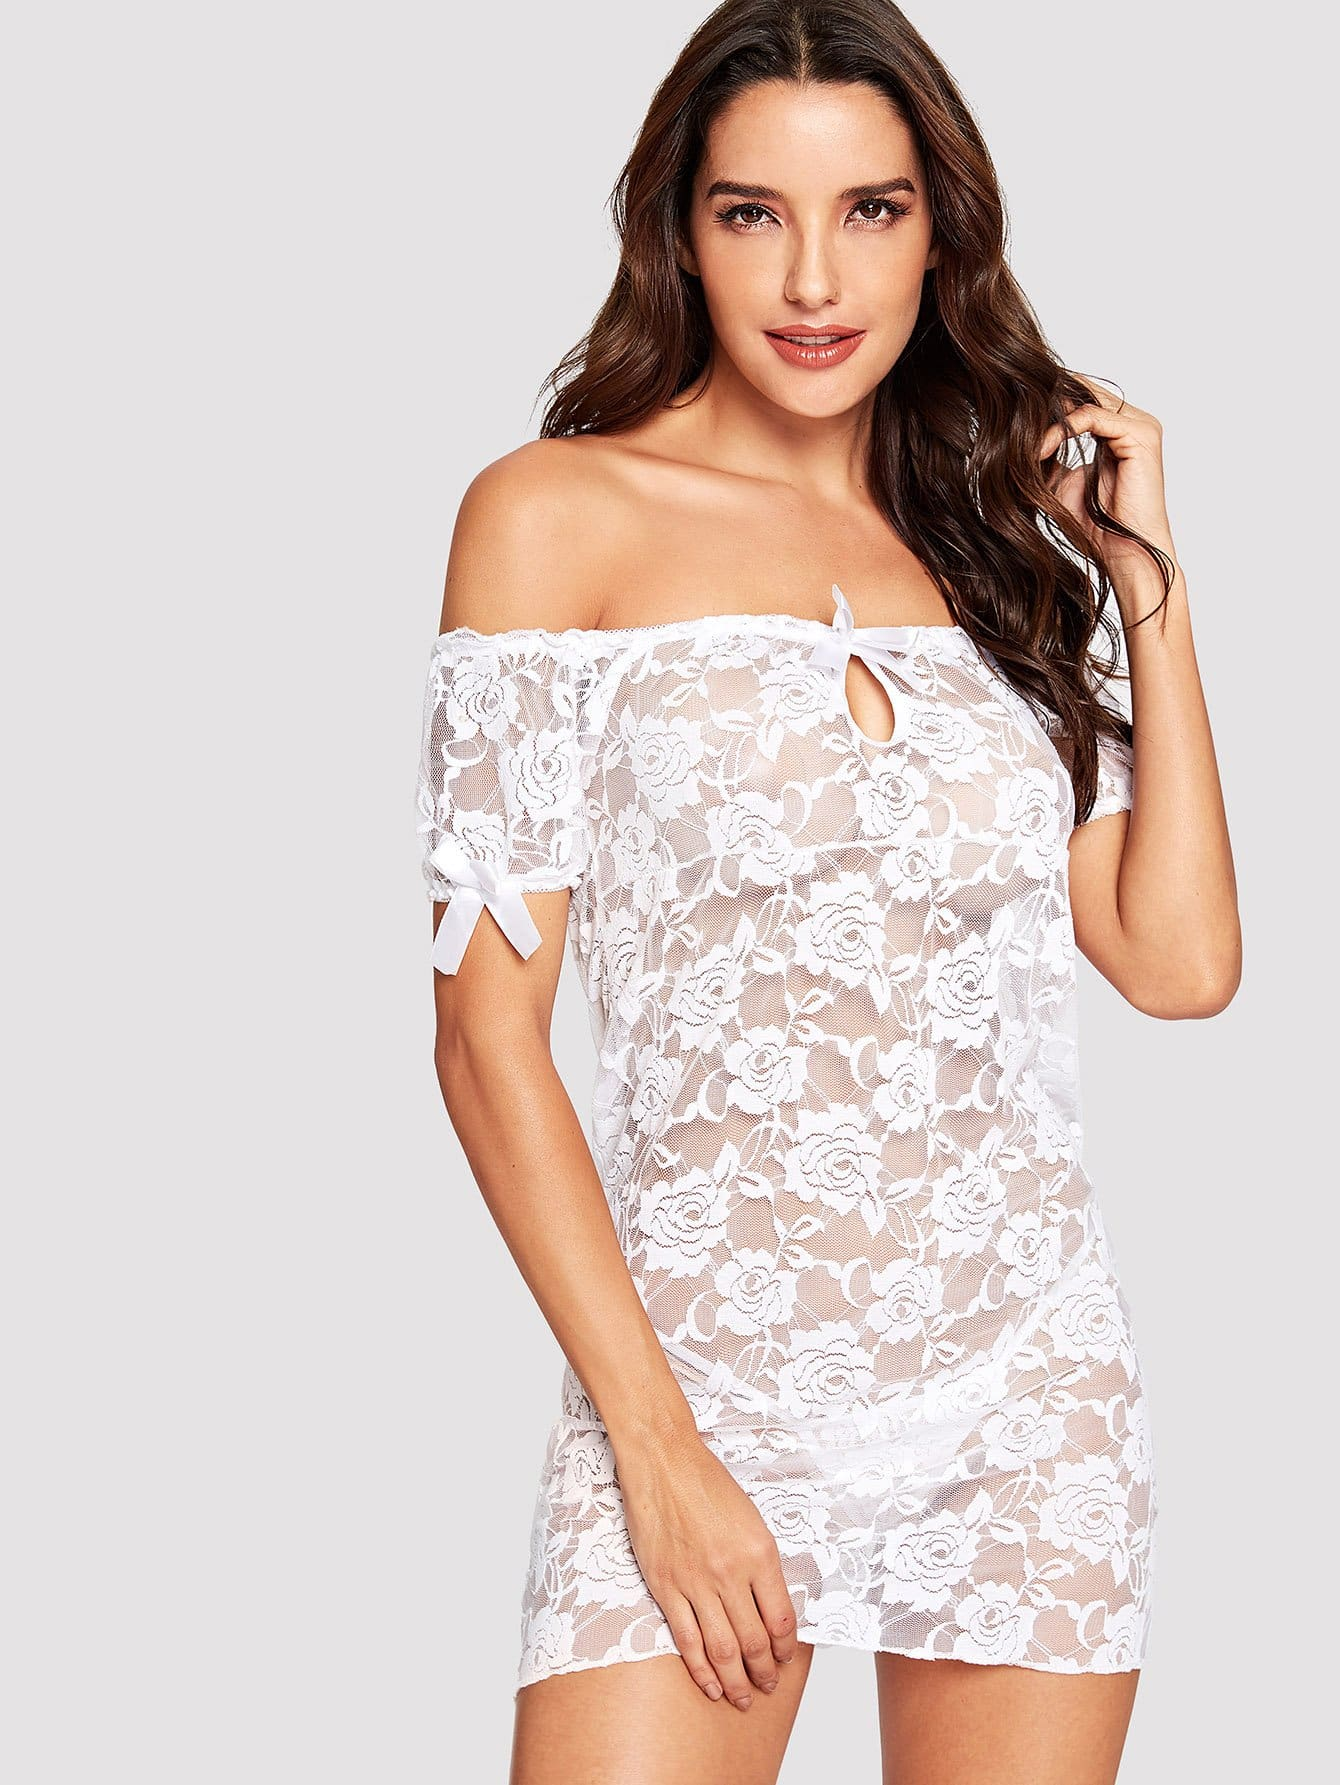 Off The Shoulder Floral Lace Dress With Thong lace off shoulder dress